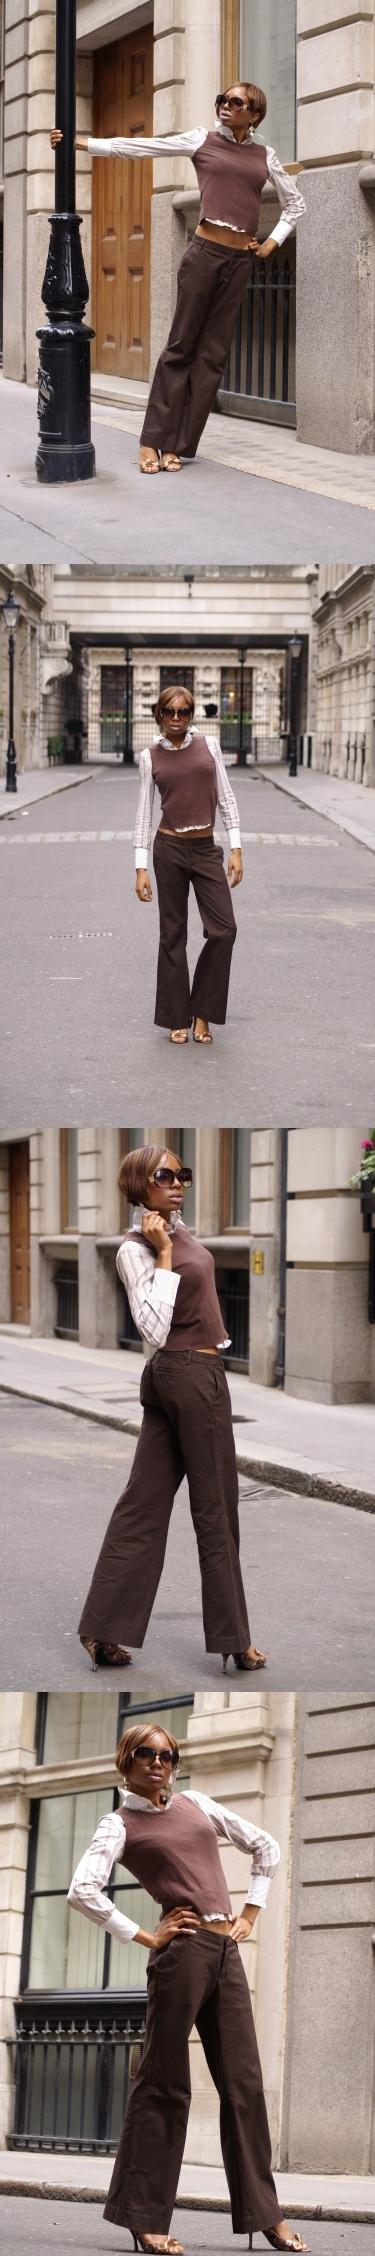 Angel, London Jun 10, 2008 Streetshooter The sofisticated look